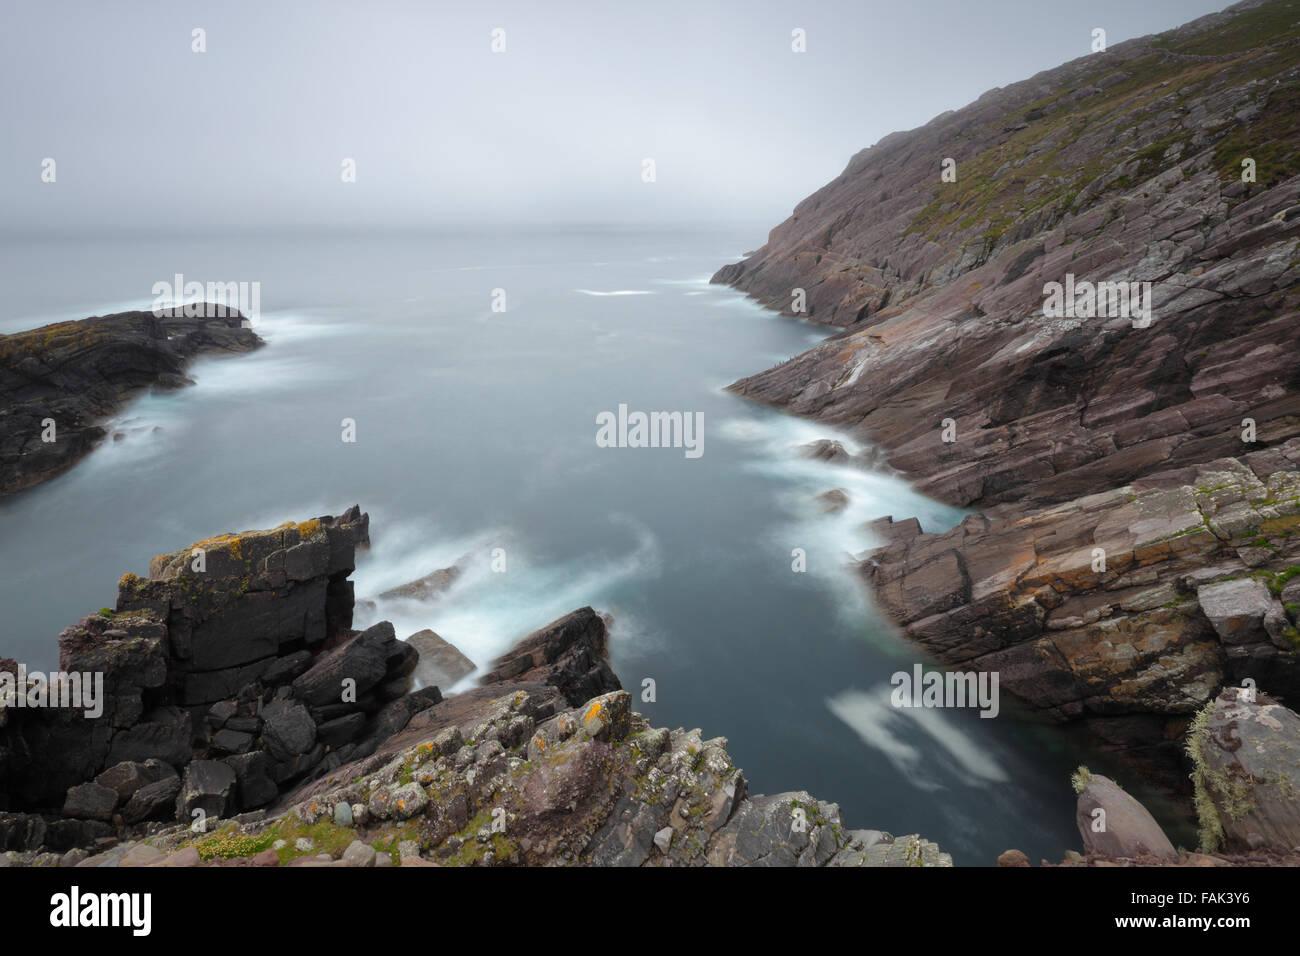 Hog's Head cliffs near Waterville, County Kerry, Ireland - Stock Image